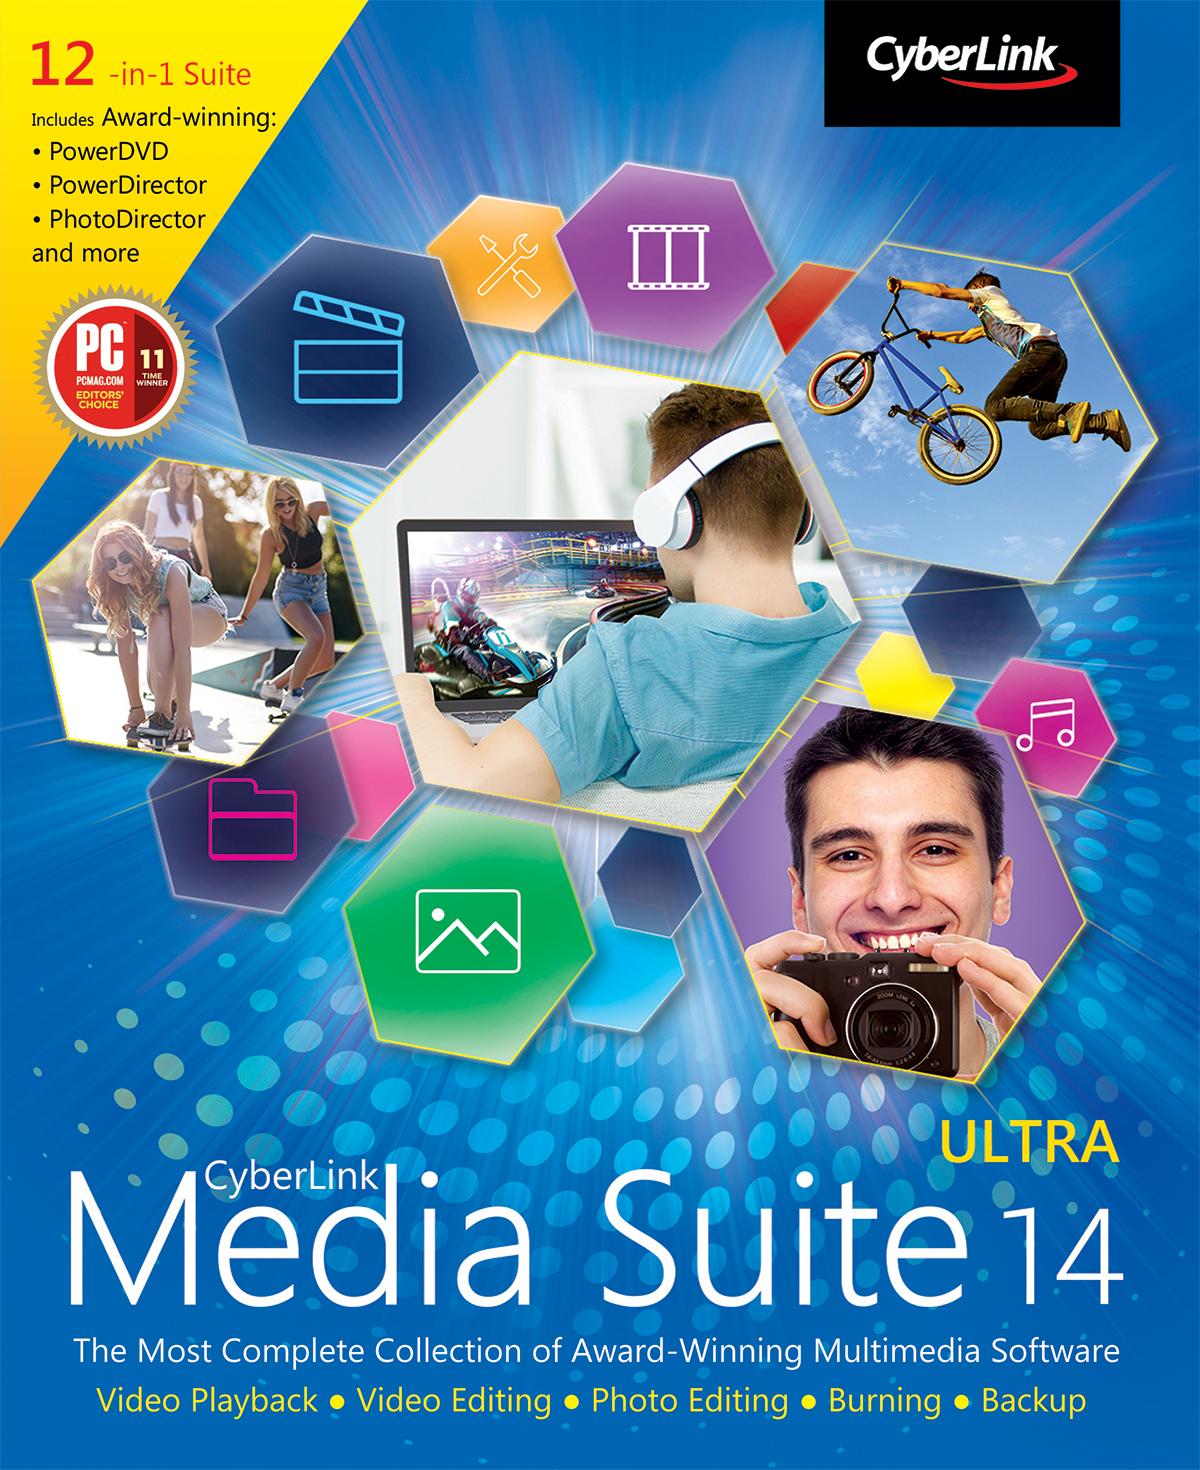 cyberlink-media-suite-14-ultra-download